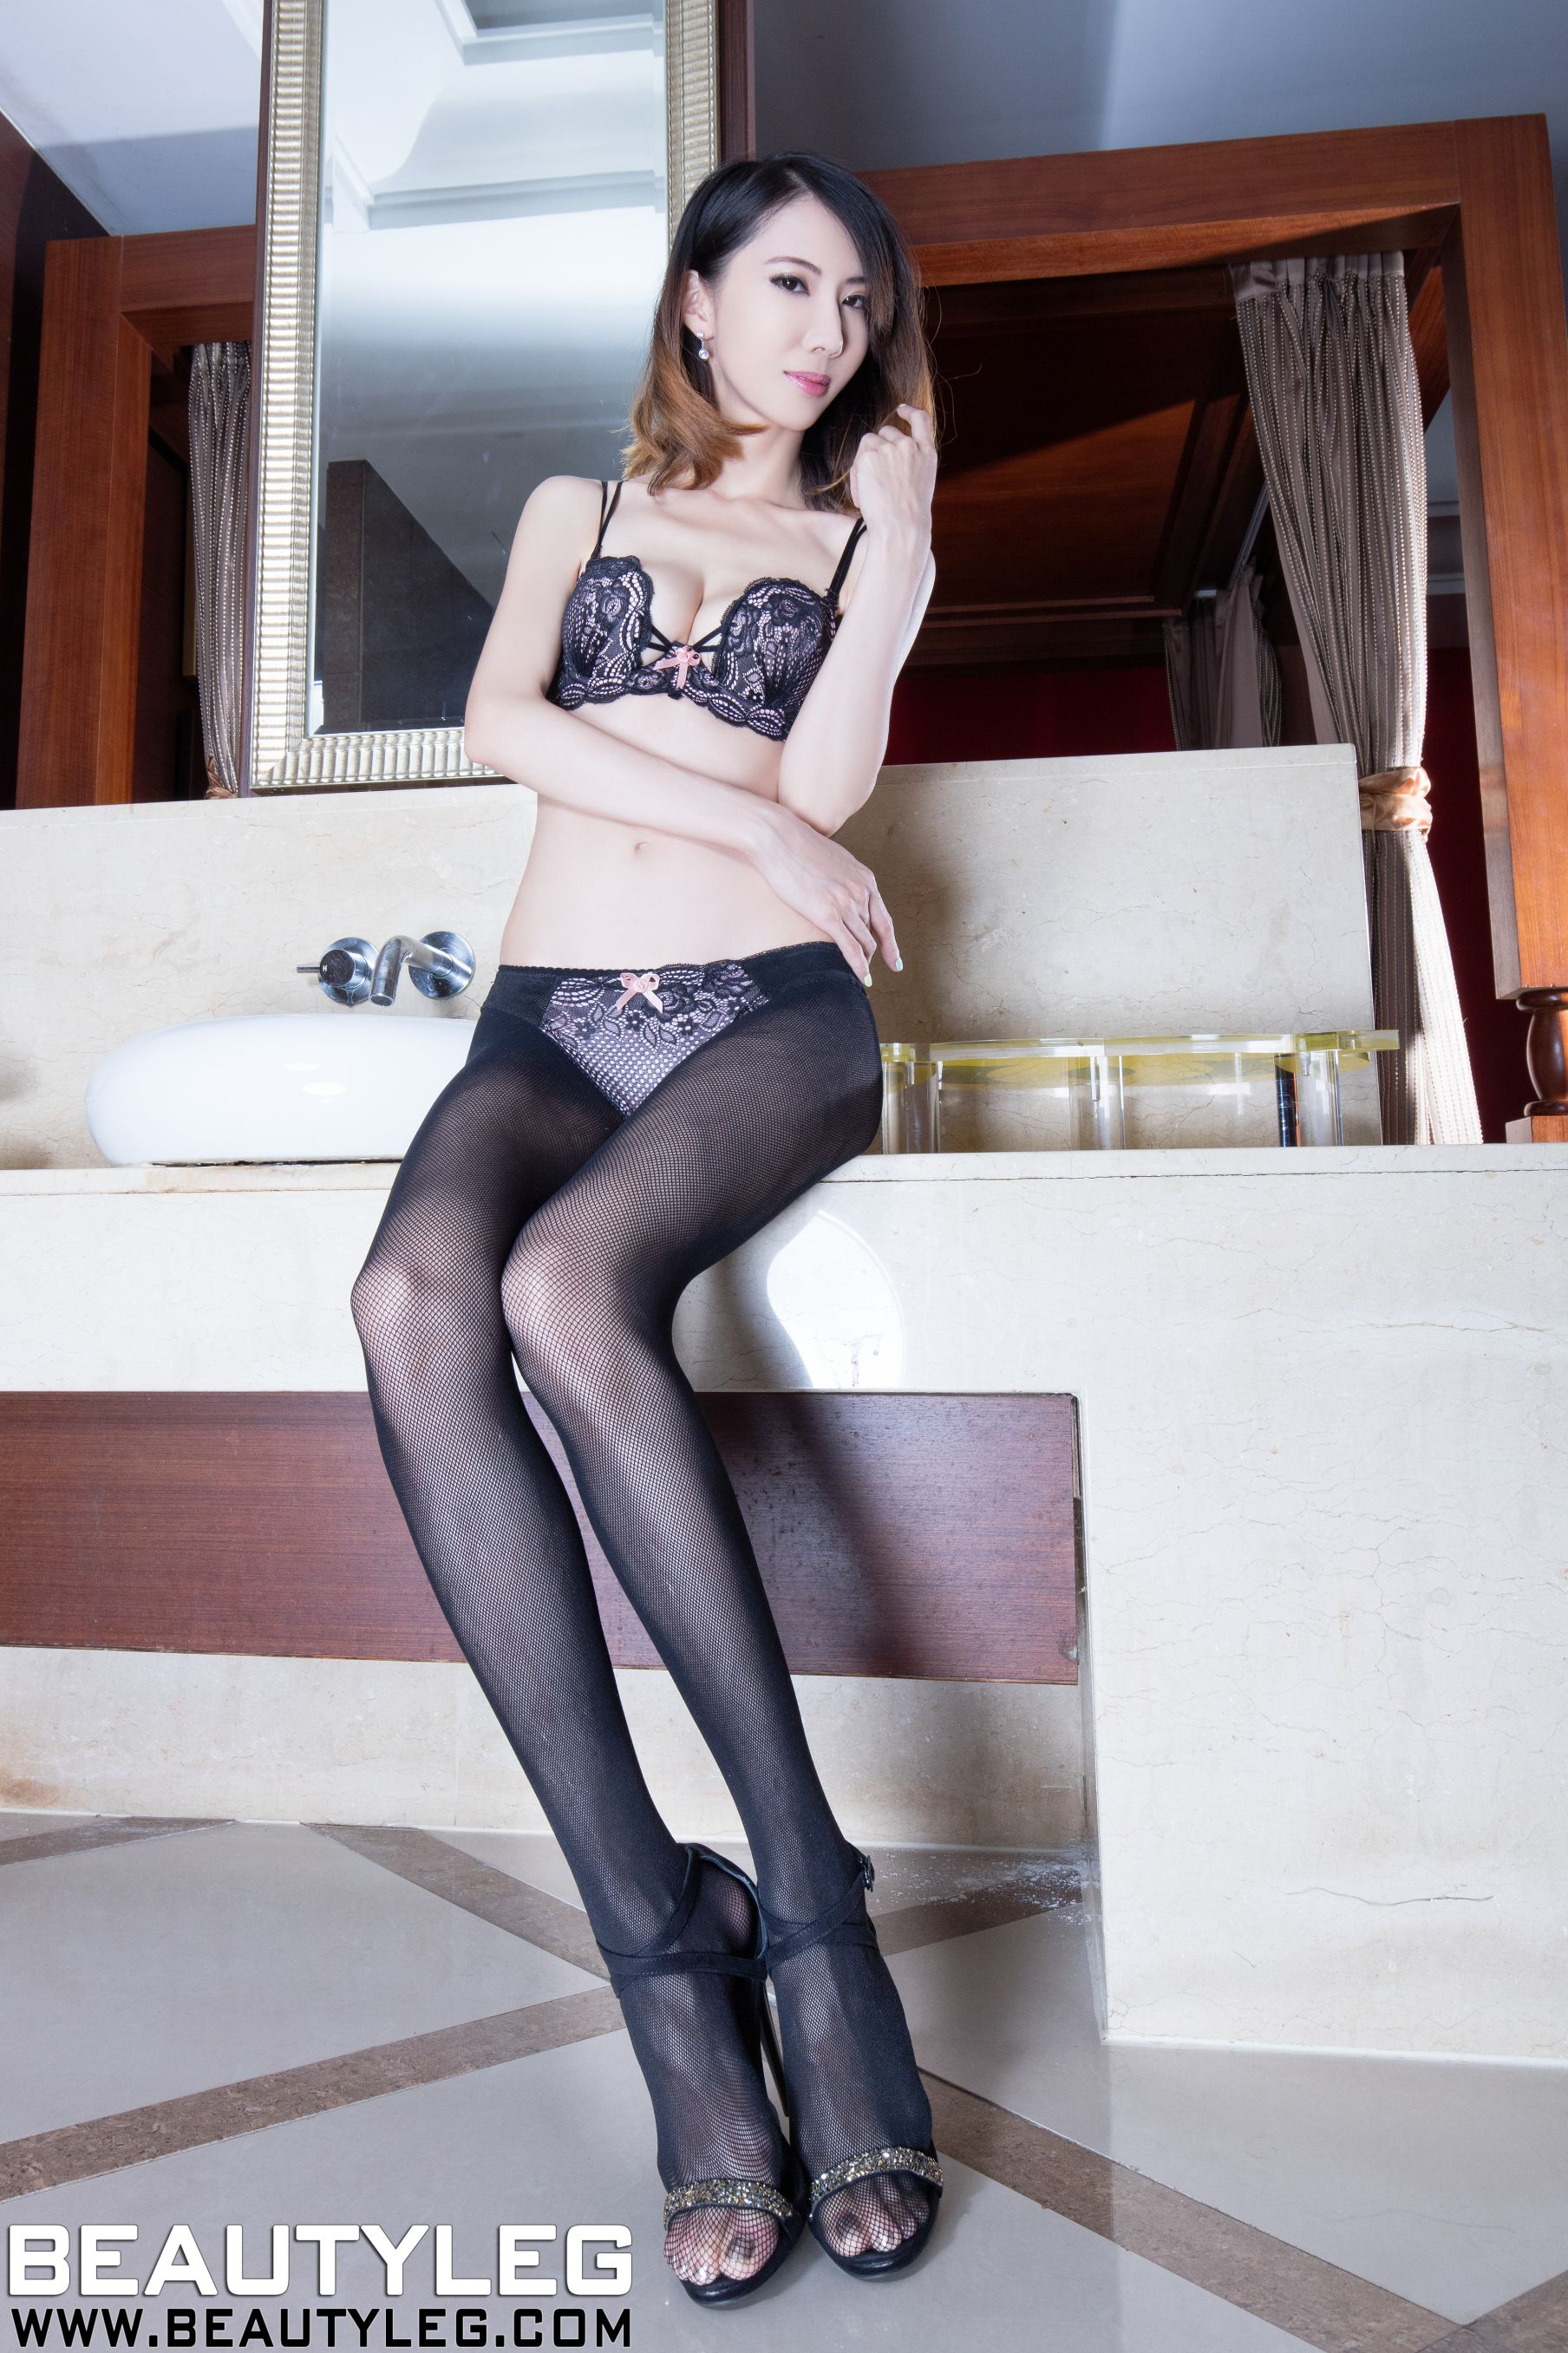 VOL.1116 [Beautyleg]高跟美腿:童采萱(Beautyleg Yoyo,腿模Yoyo)高品质写真套图(36P)